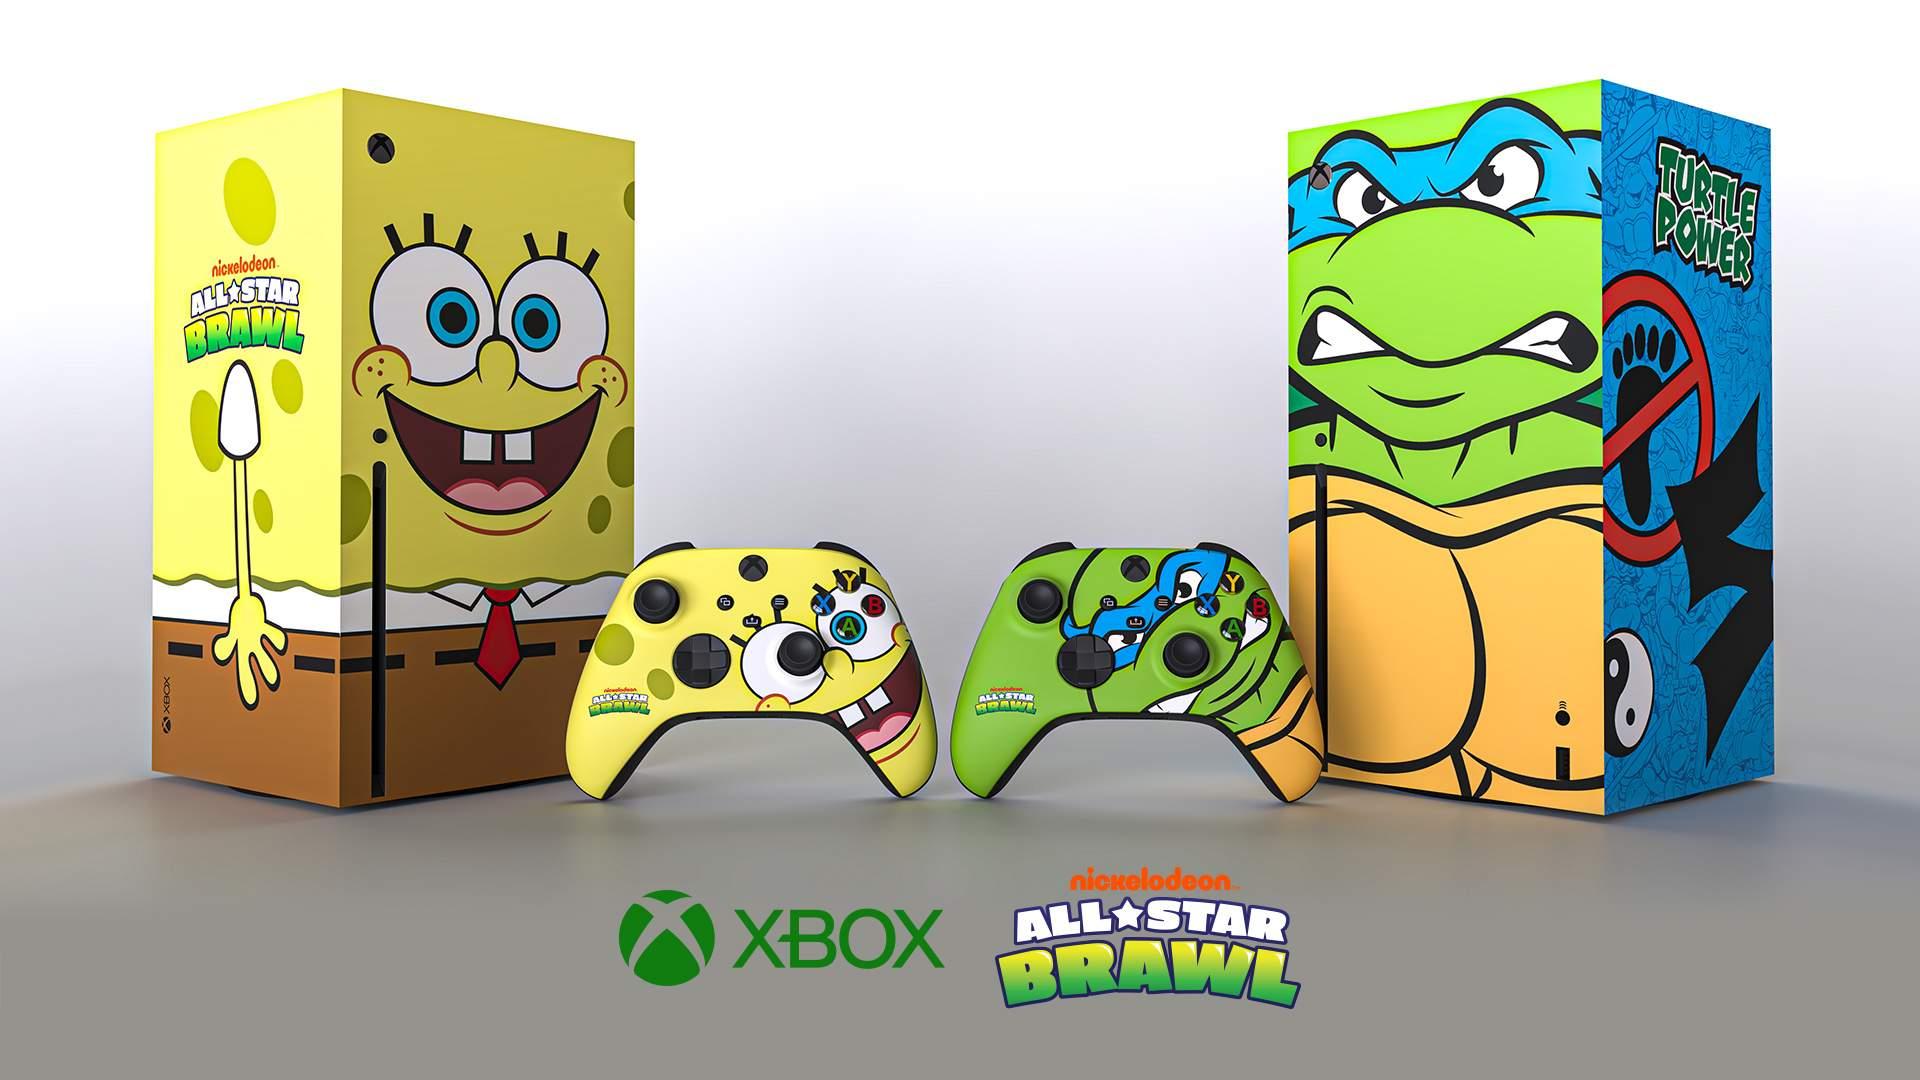 Spongebob Squarepants is now an Xbox Series X